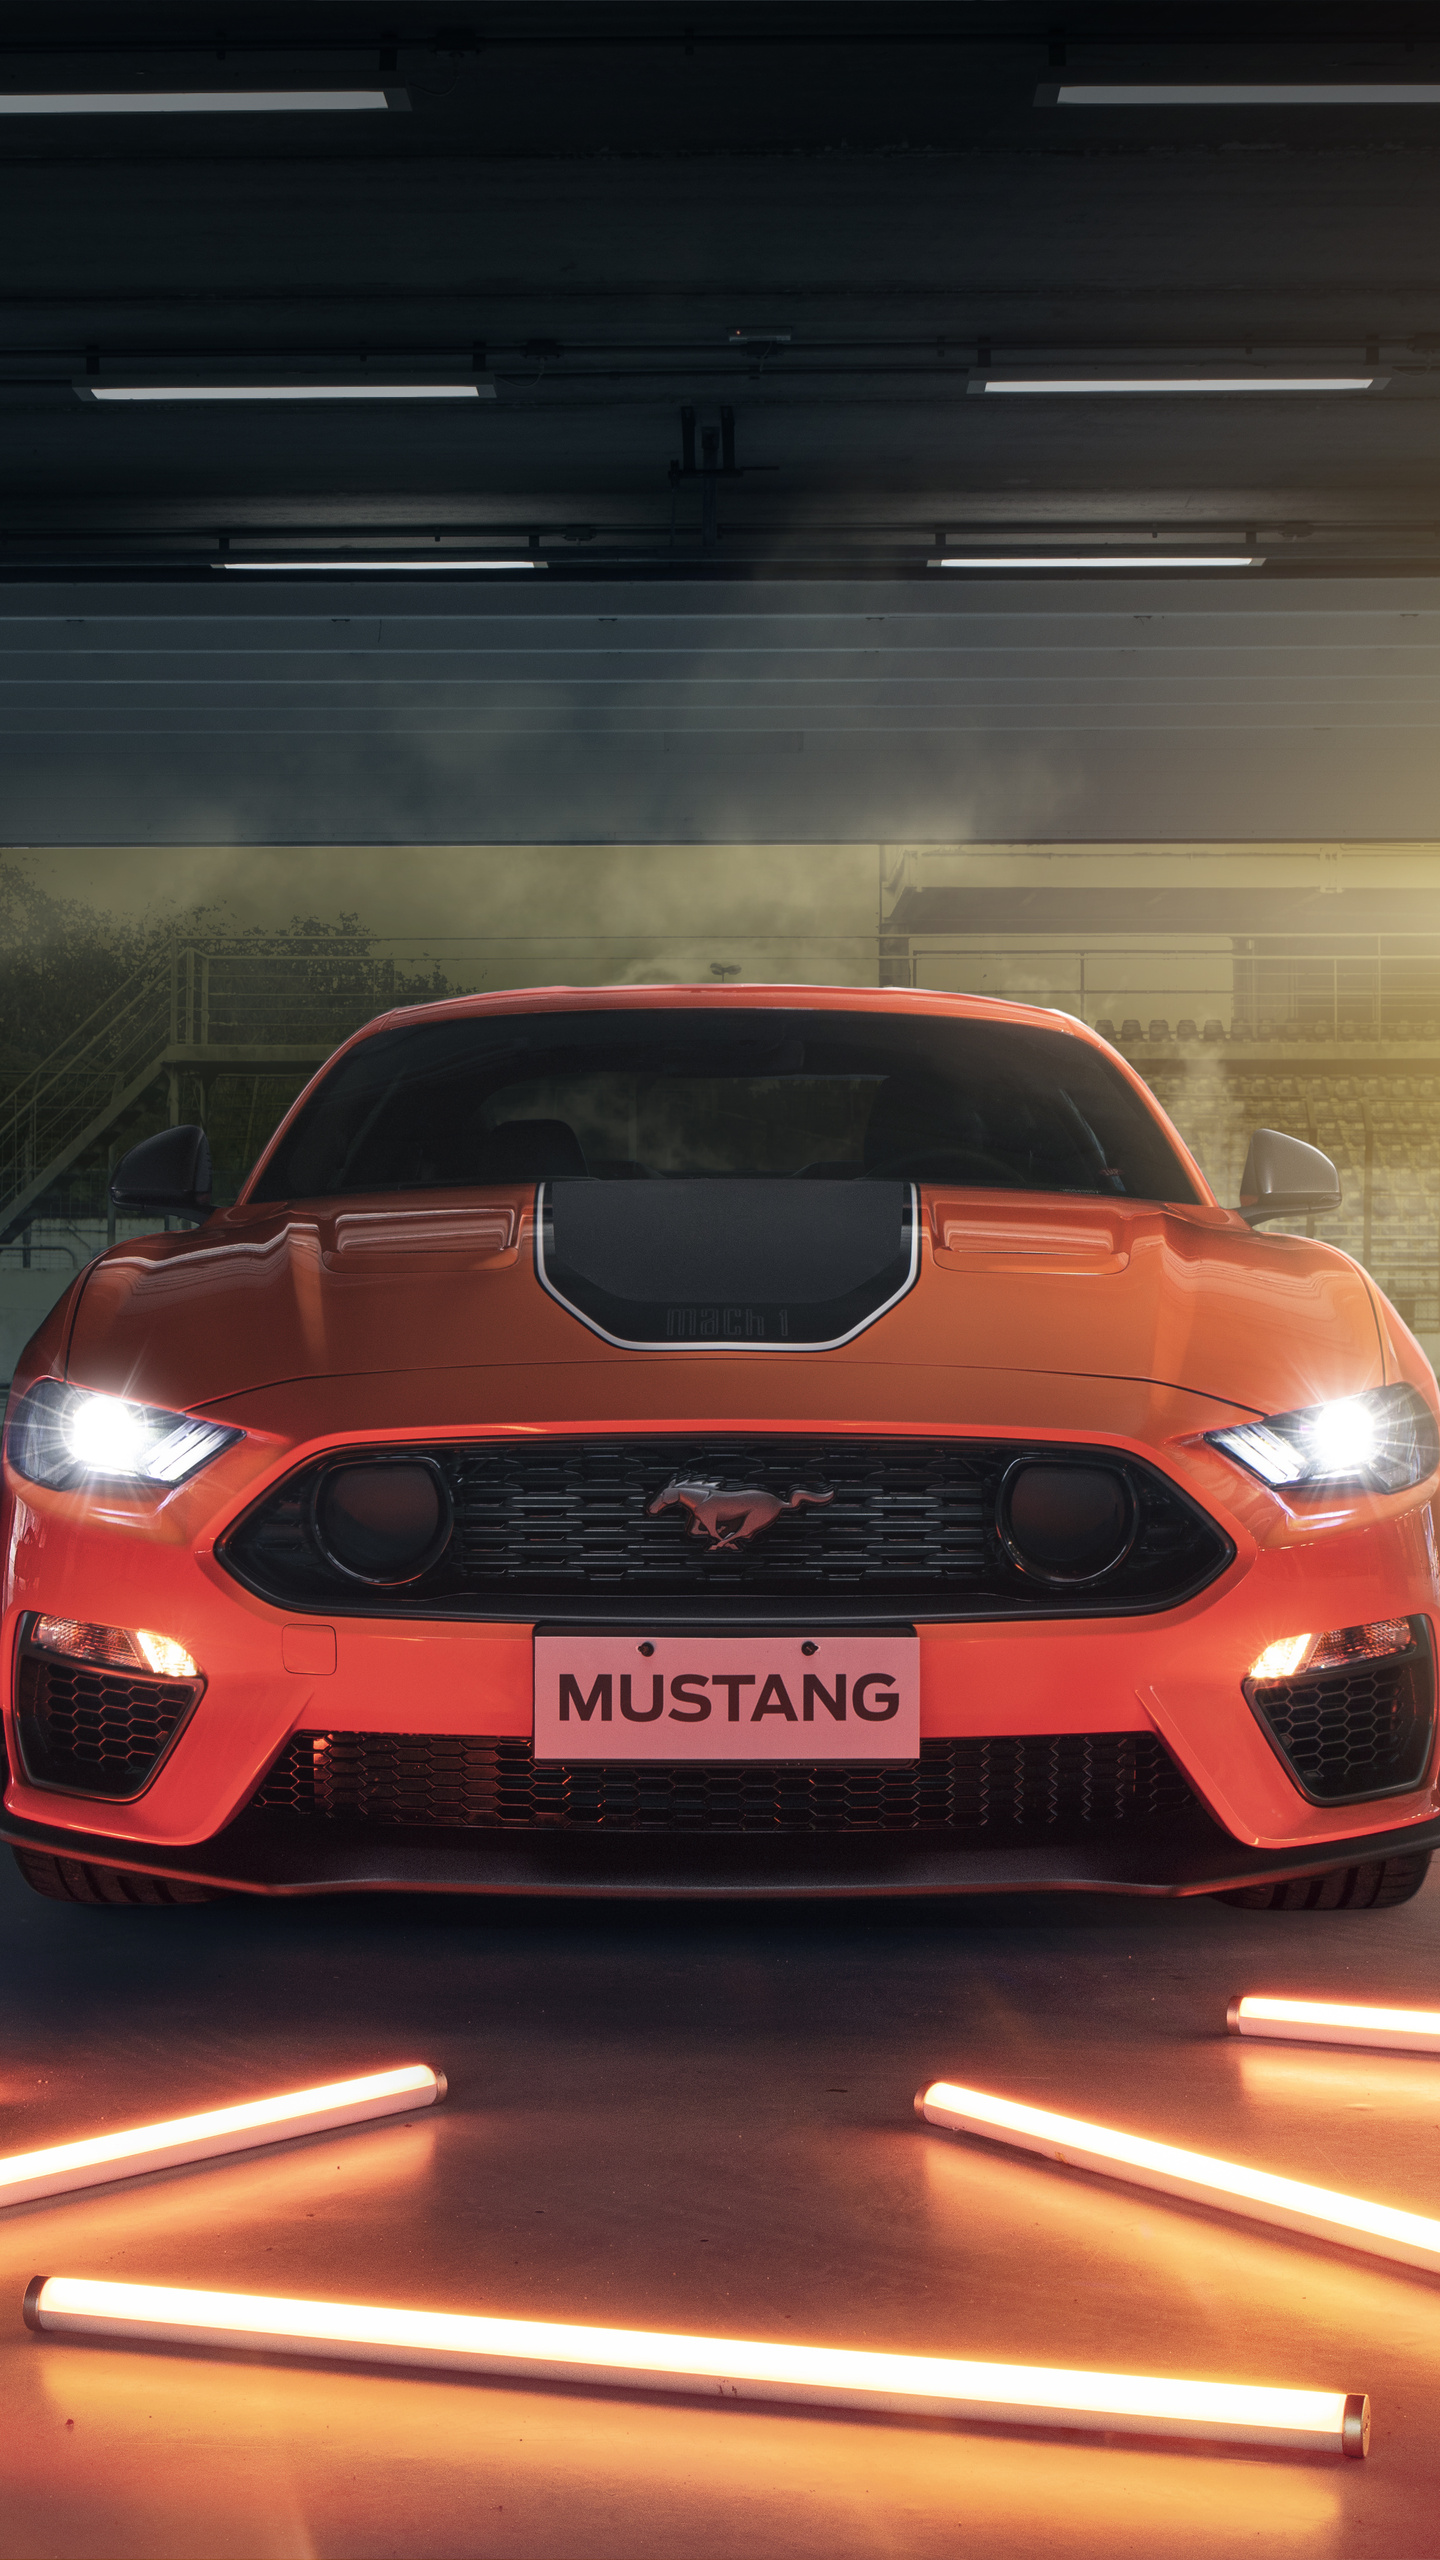 2021-ford-mustang-mach1-5k-4o.jpg